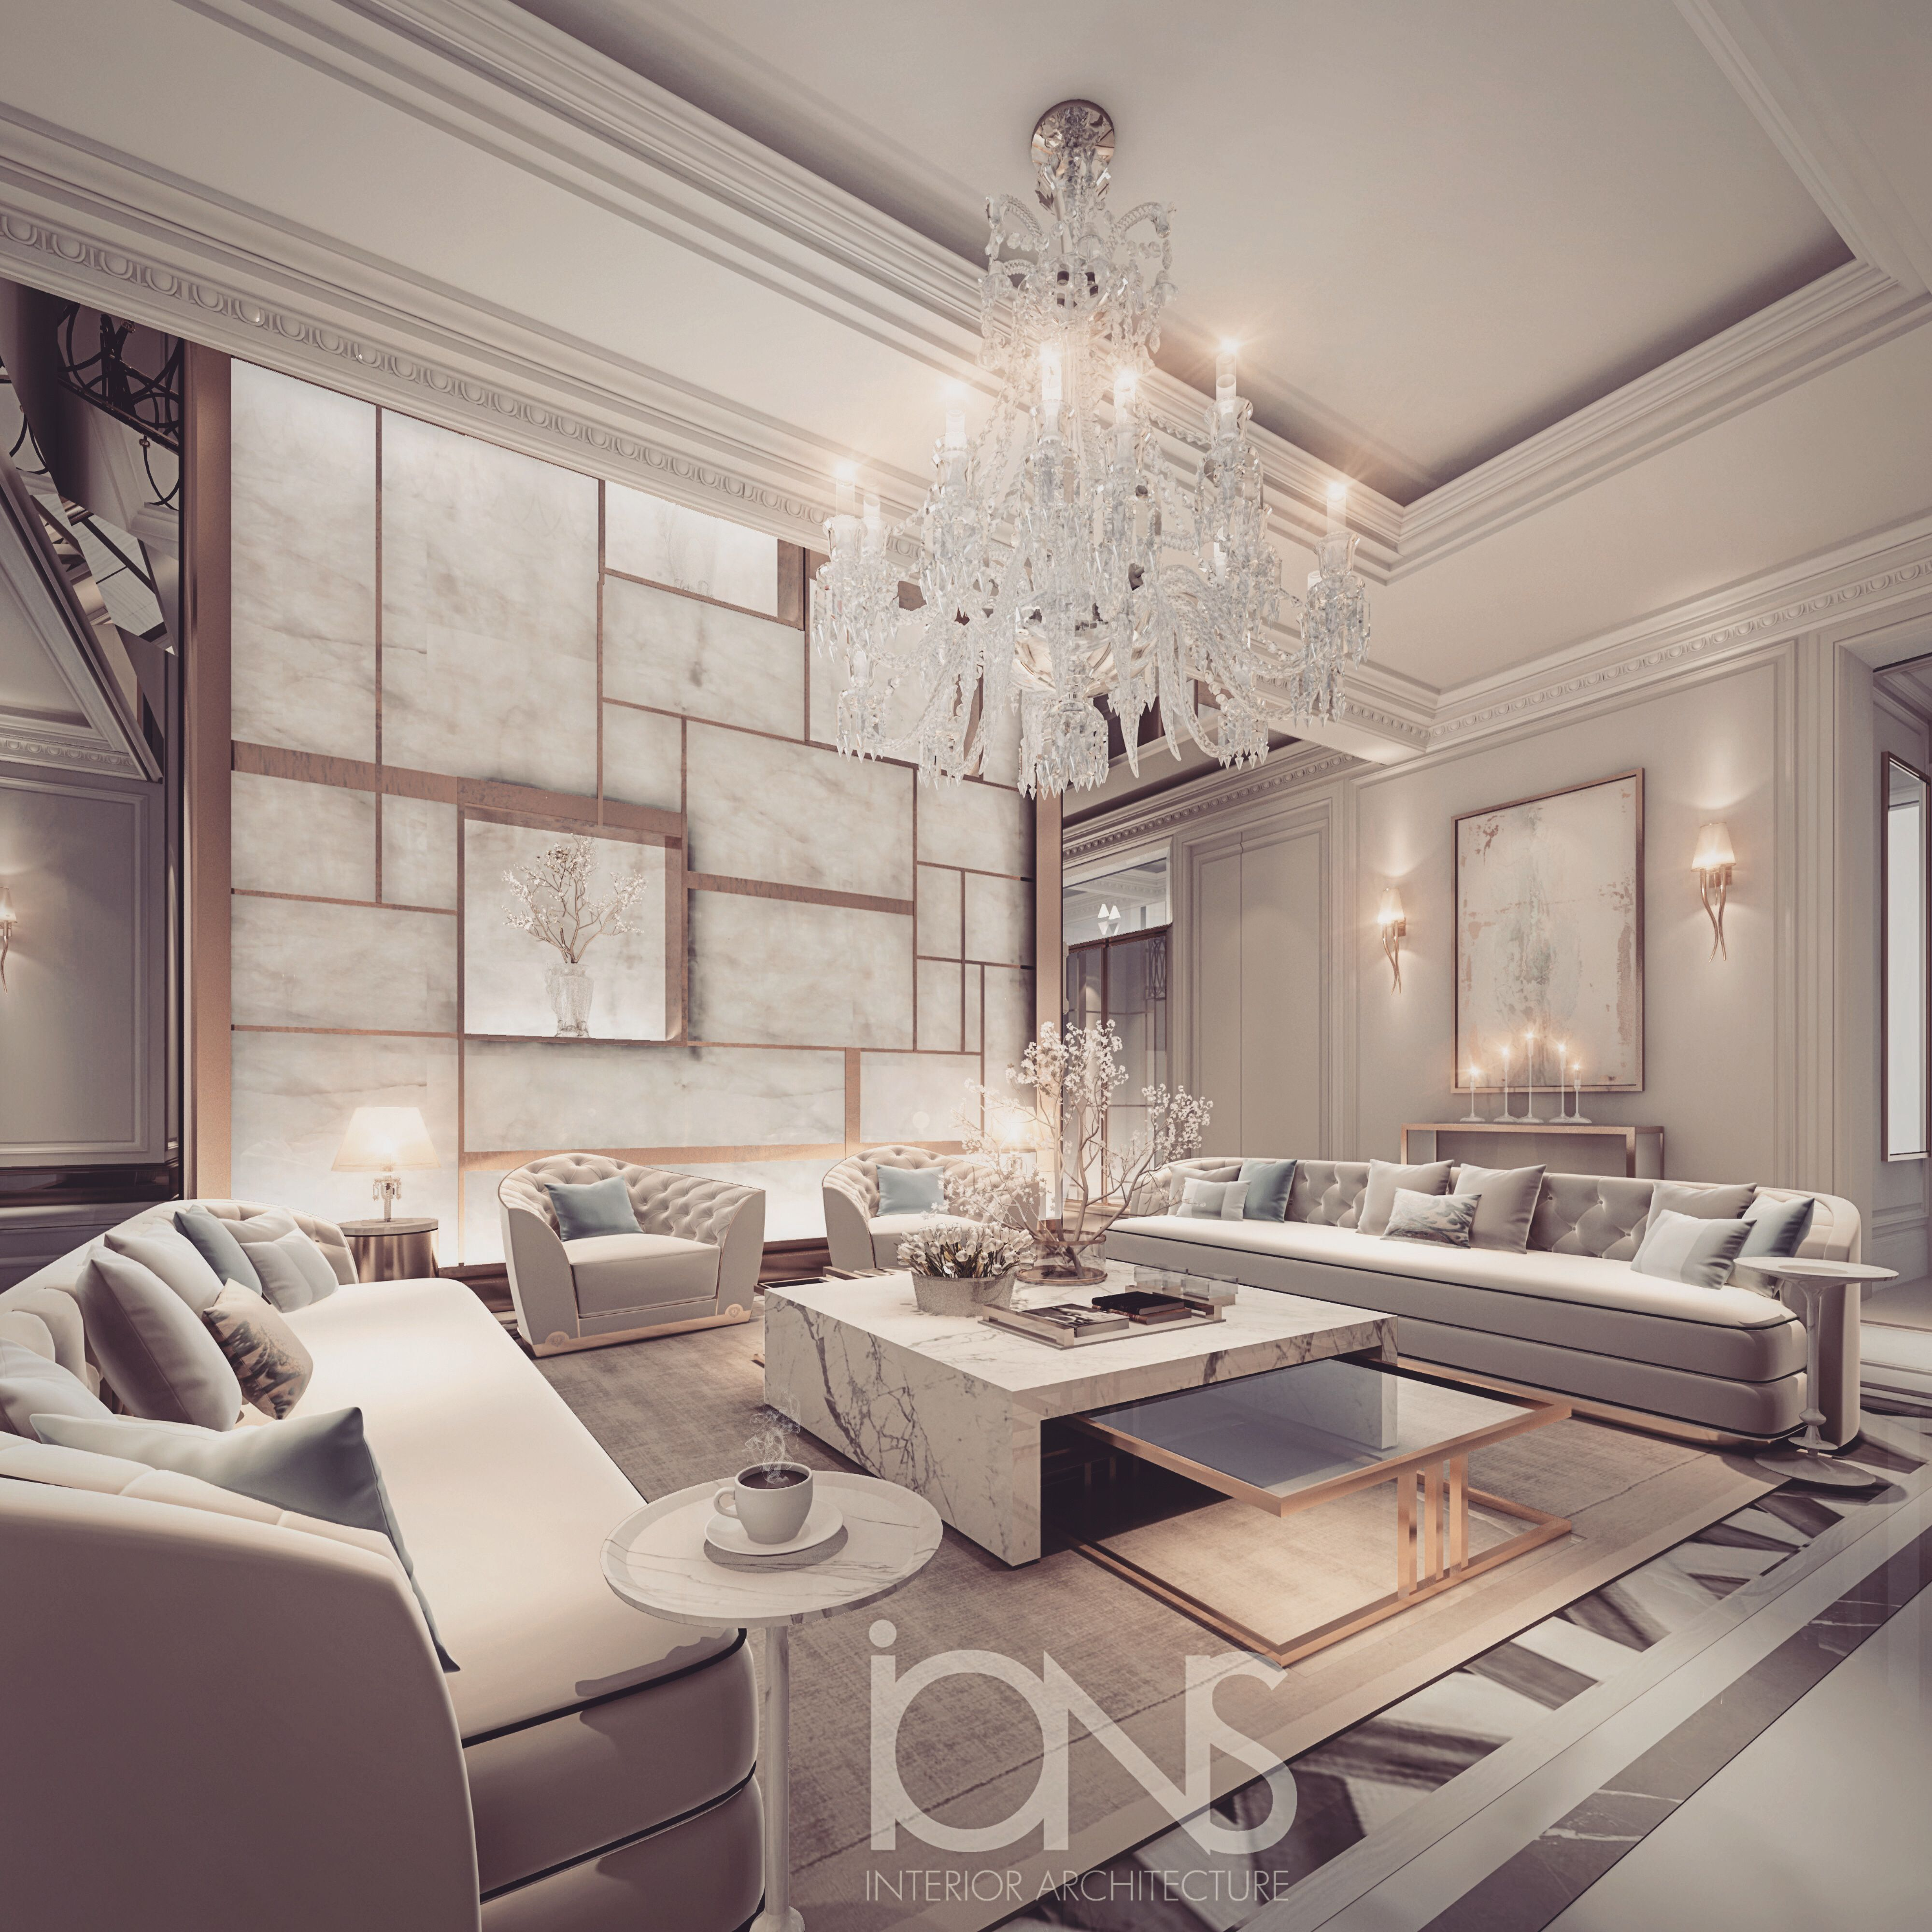 Contemporary And Aesthetically Pleasing Living Room Design Ions Design Luxury Interior Design Living Room Mansion Living Room Home Design Living Room